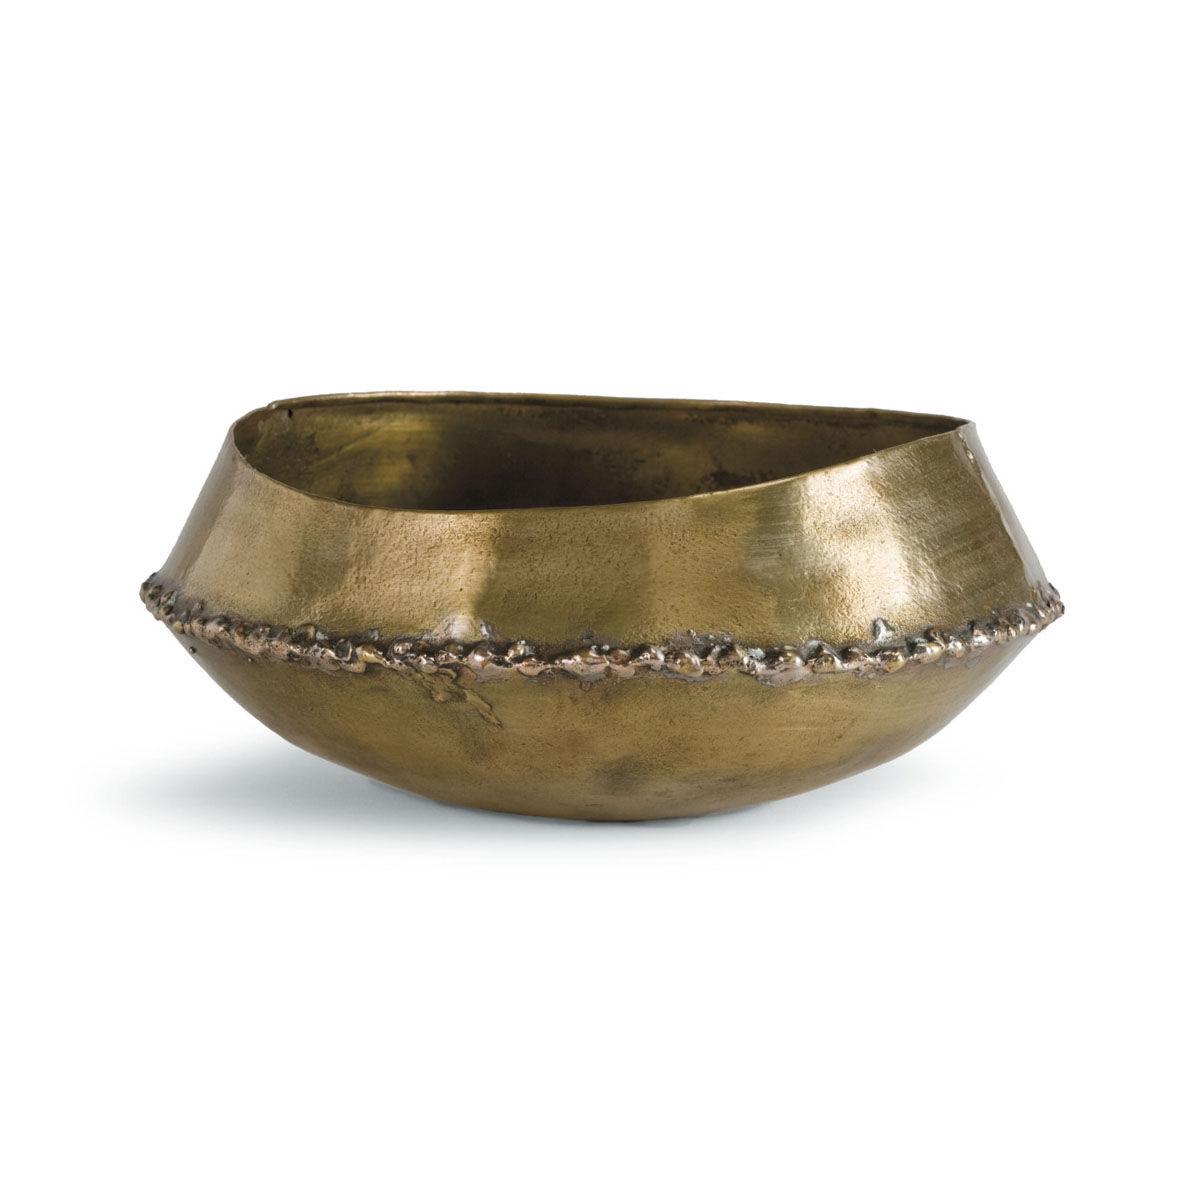 Bedouin Bowl Small (Brass)